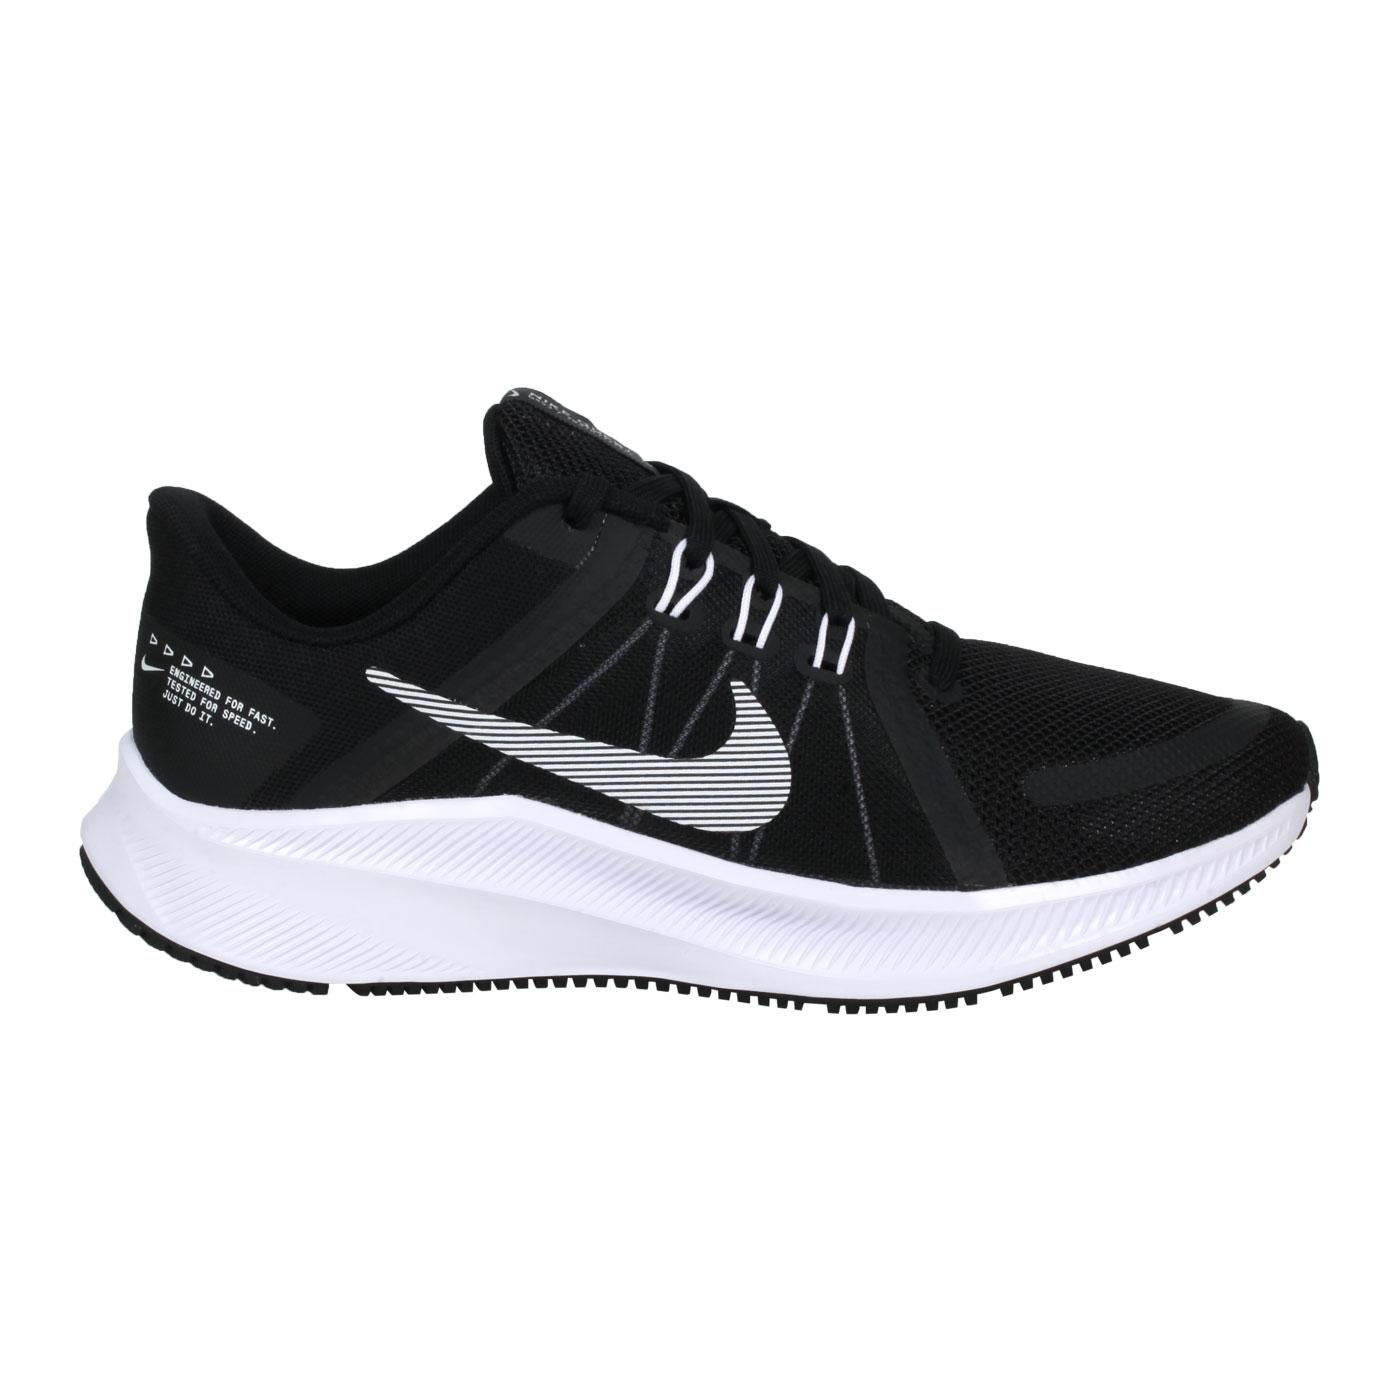 NIKE 女款慢跑鞋  @WMNS QUEST 4@DA1106006 - 黑白